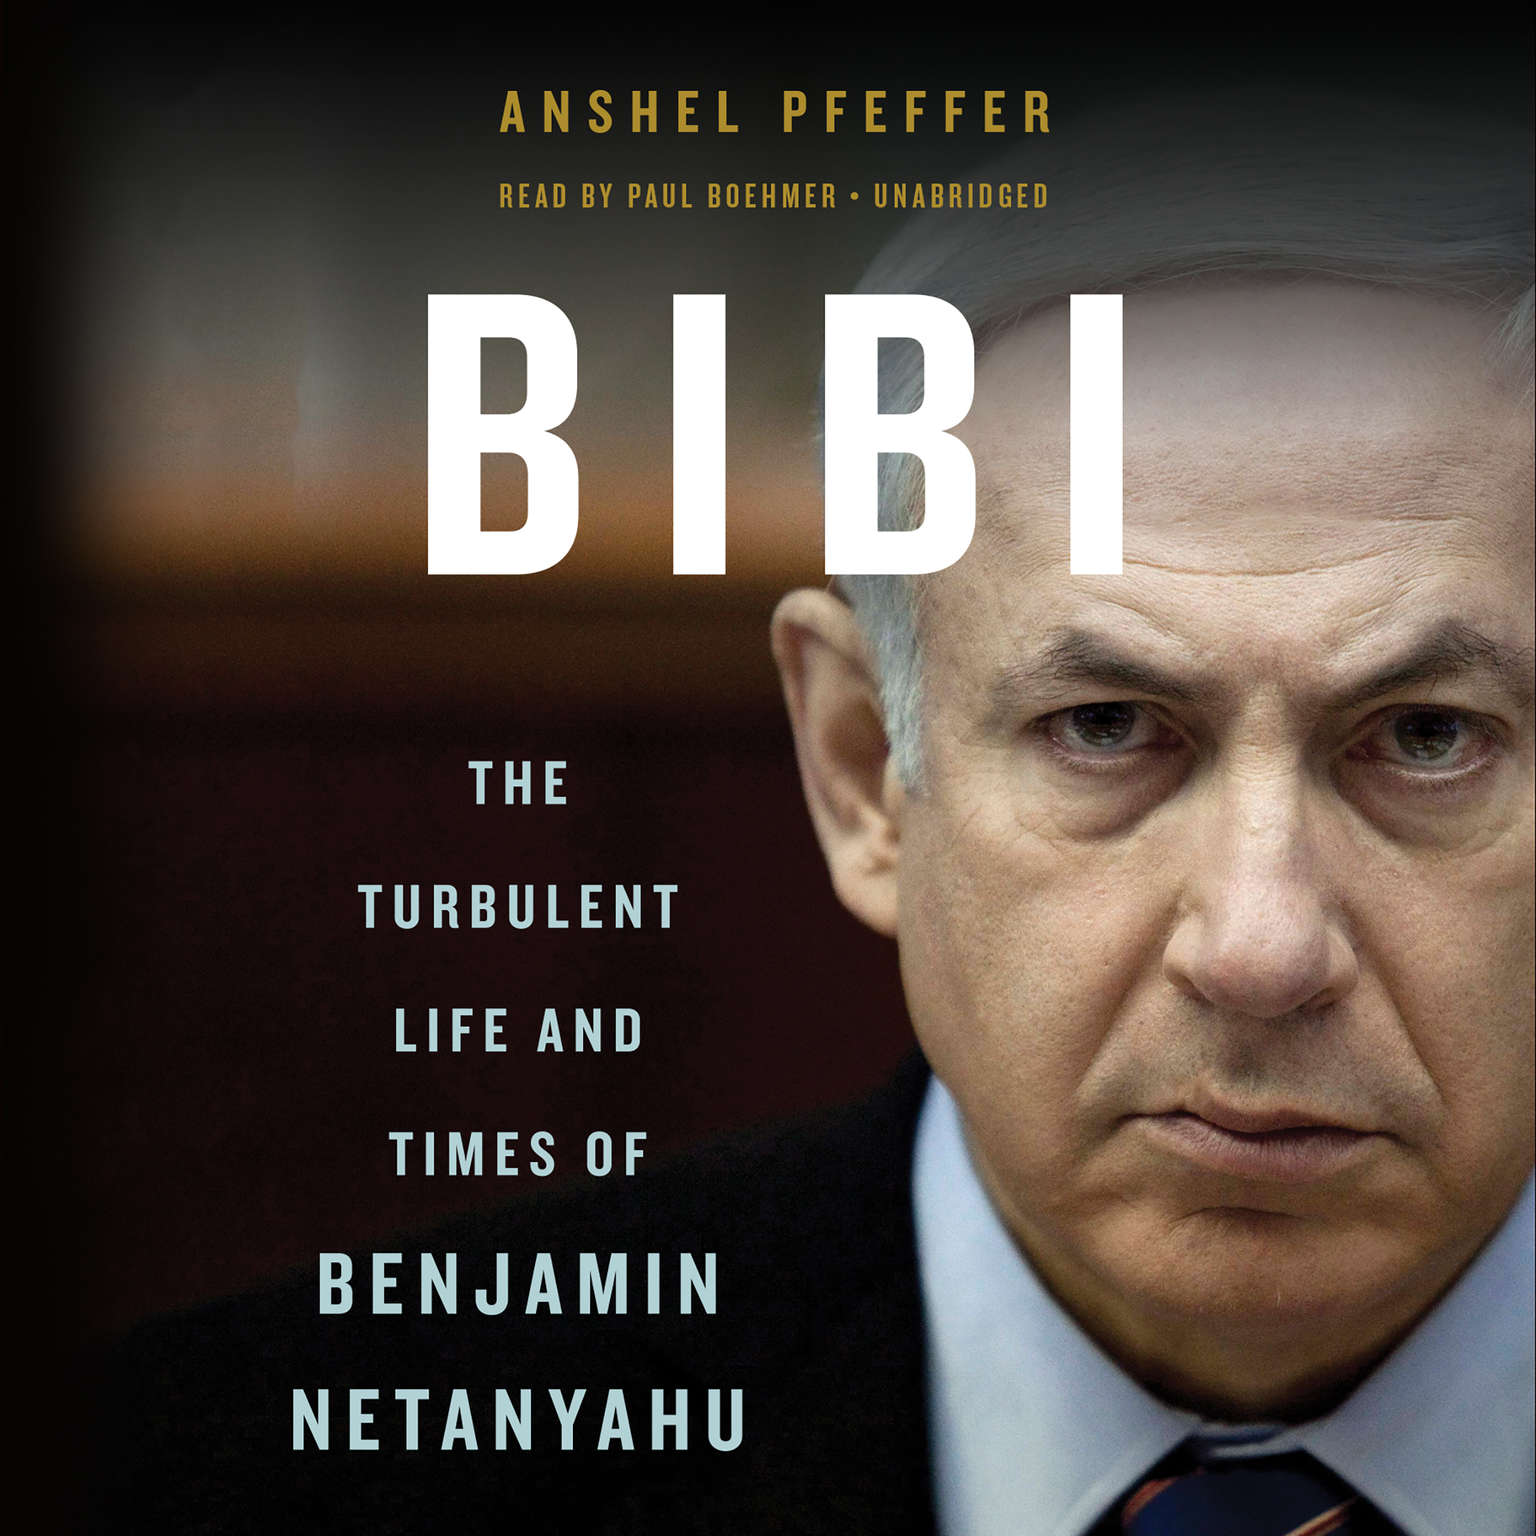 Bibi: The Turbulent Life and Times of Benjamin Netanyahu Audiobook, by Anshel Pfeffer